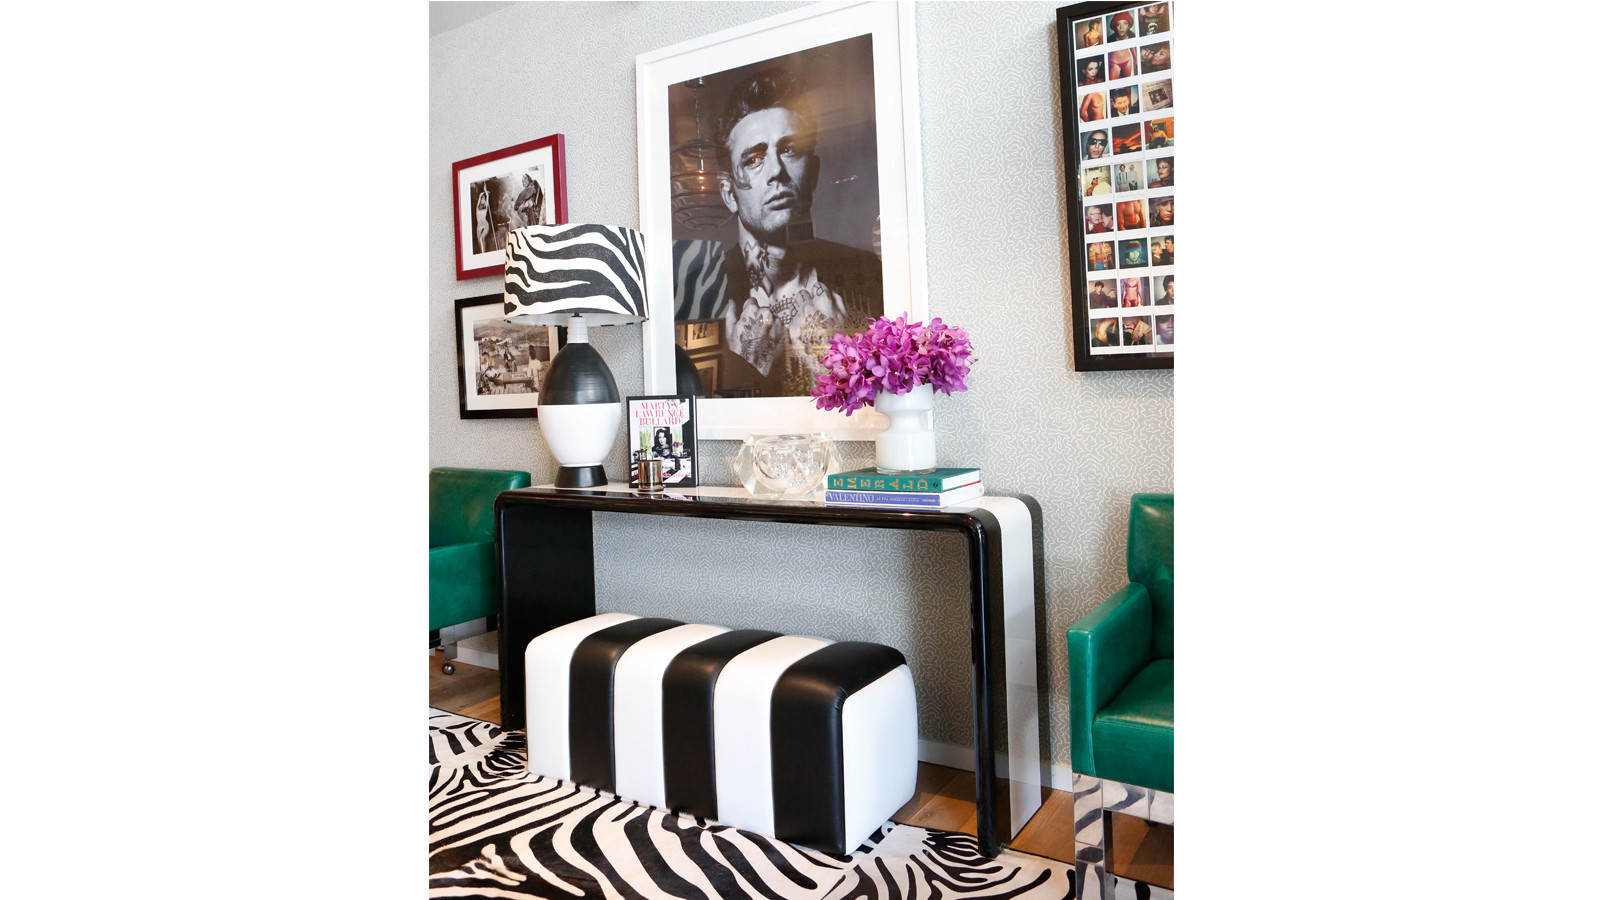 Bullard originally designed this black-and-white console for Kris Jenner.